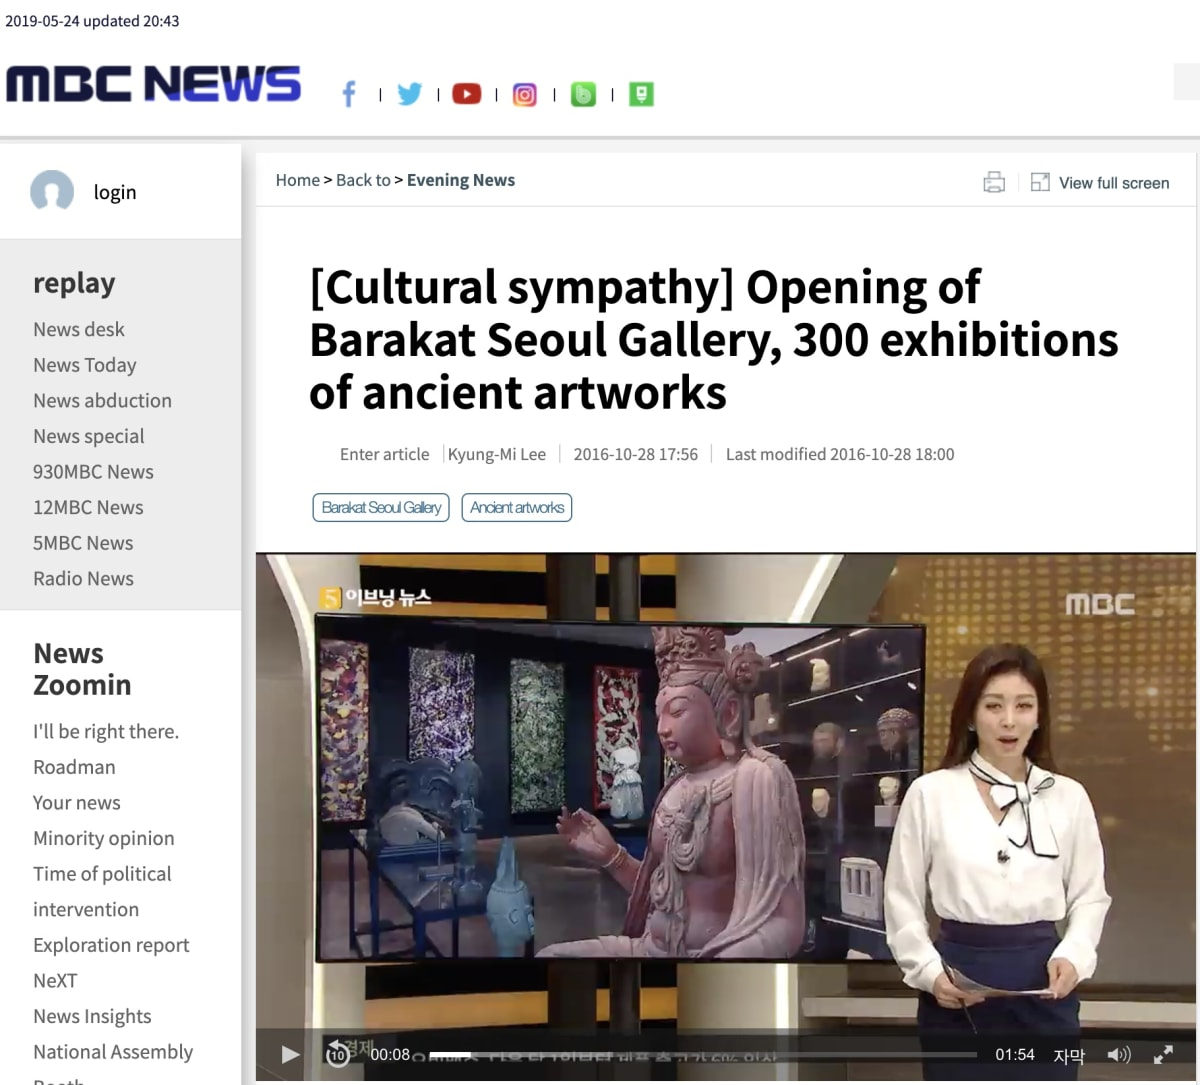 MBC Evening News - Opening of Barakat Seoul Gallery